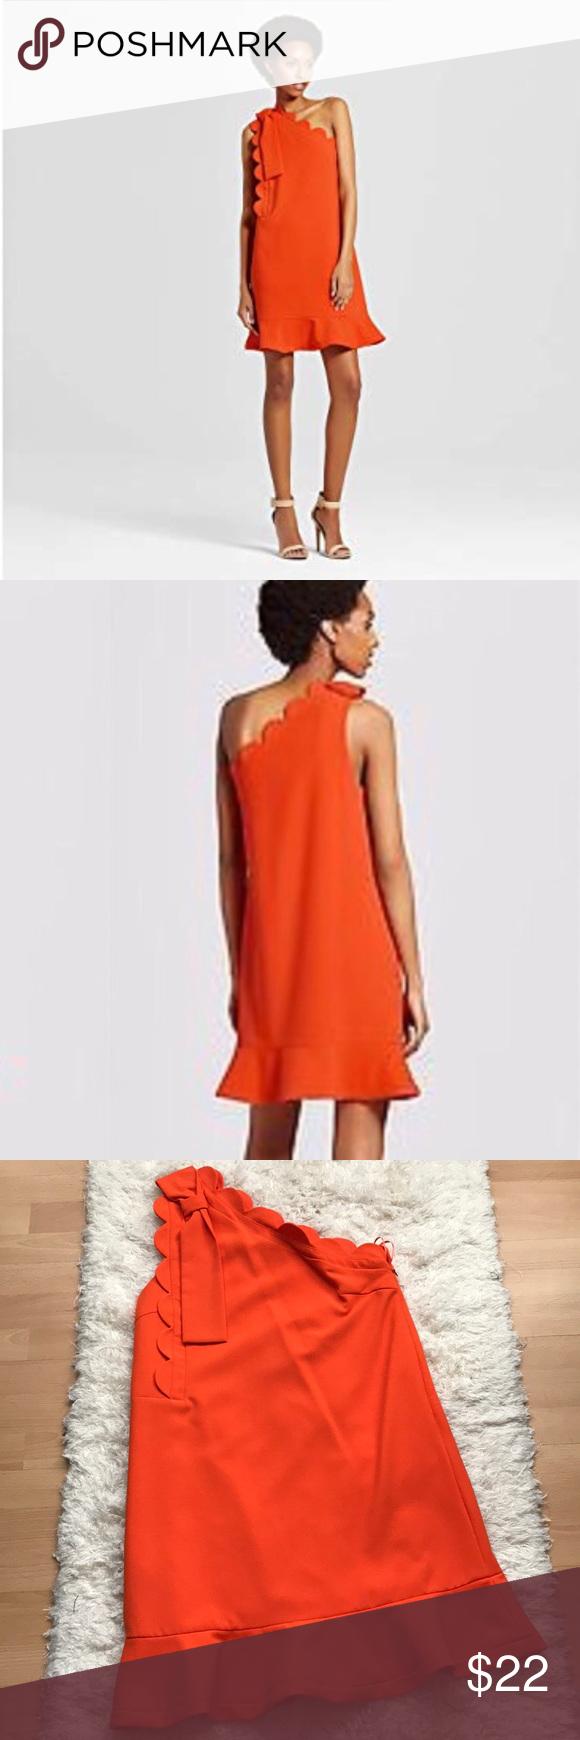 Victoria Beckham For Target Dress Small Target Dress Victoria Beckham Target Clothes Design [ 1740 x 580 Pixel ]